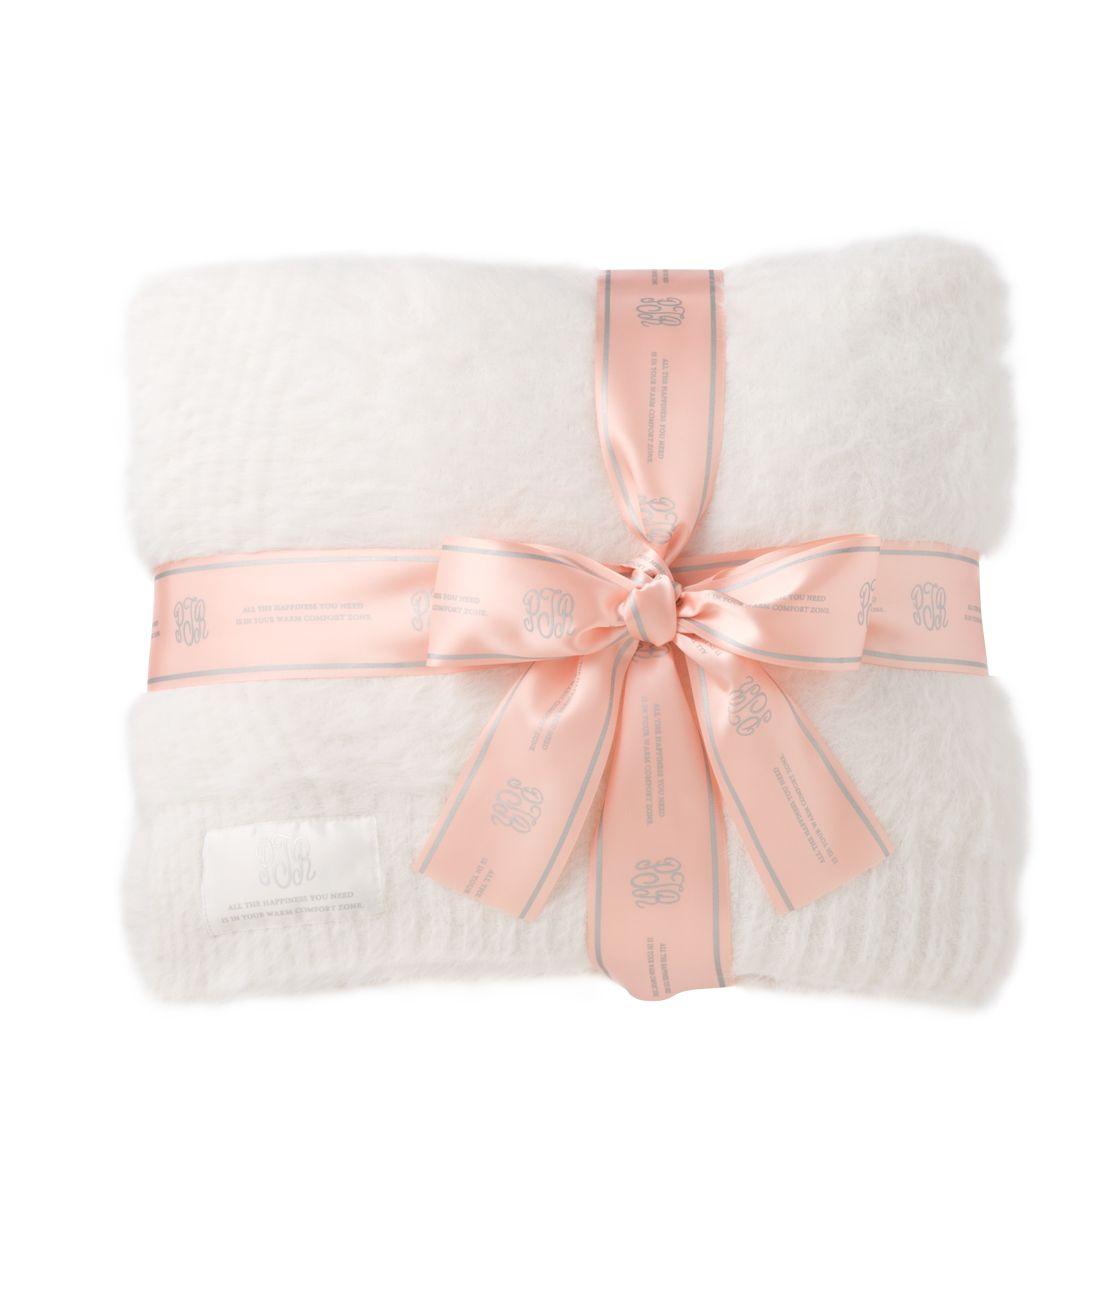 Cat yarn blanket